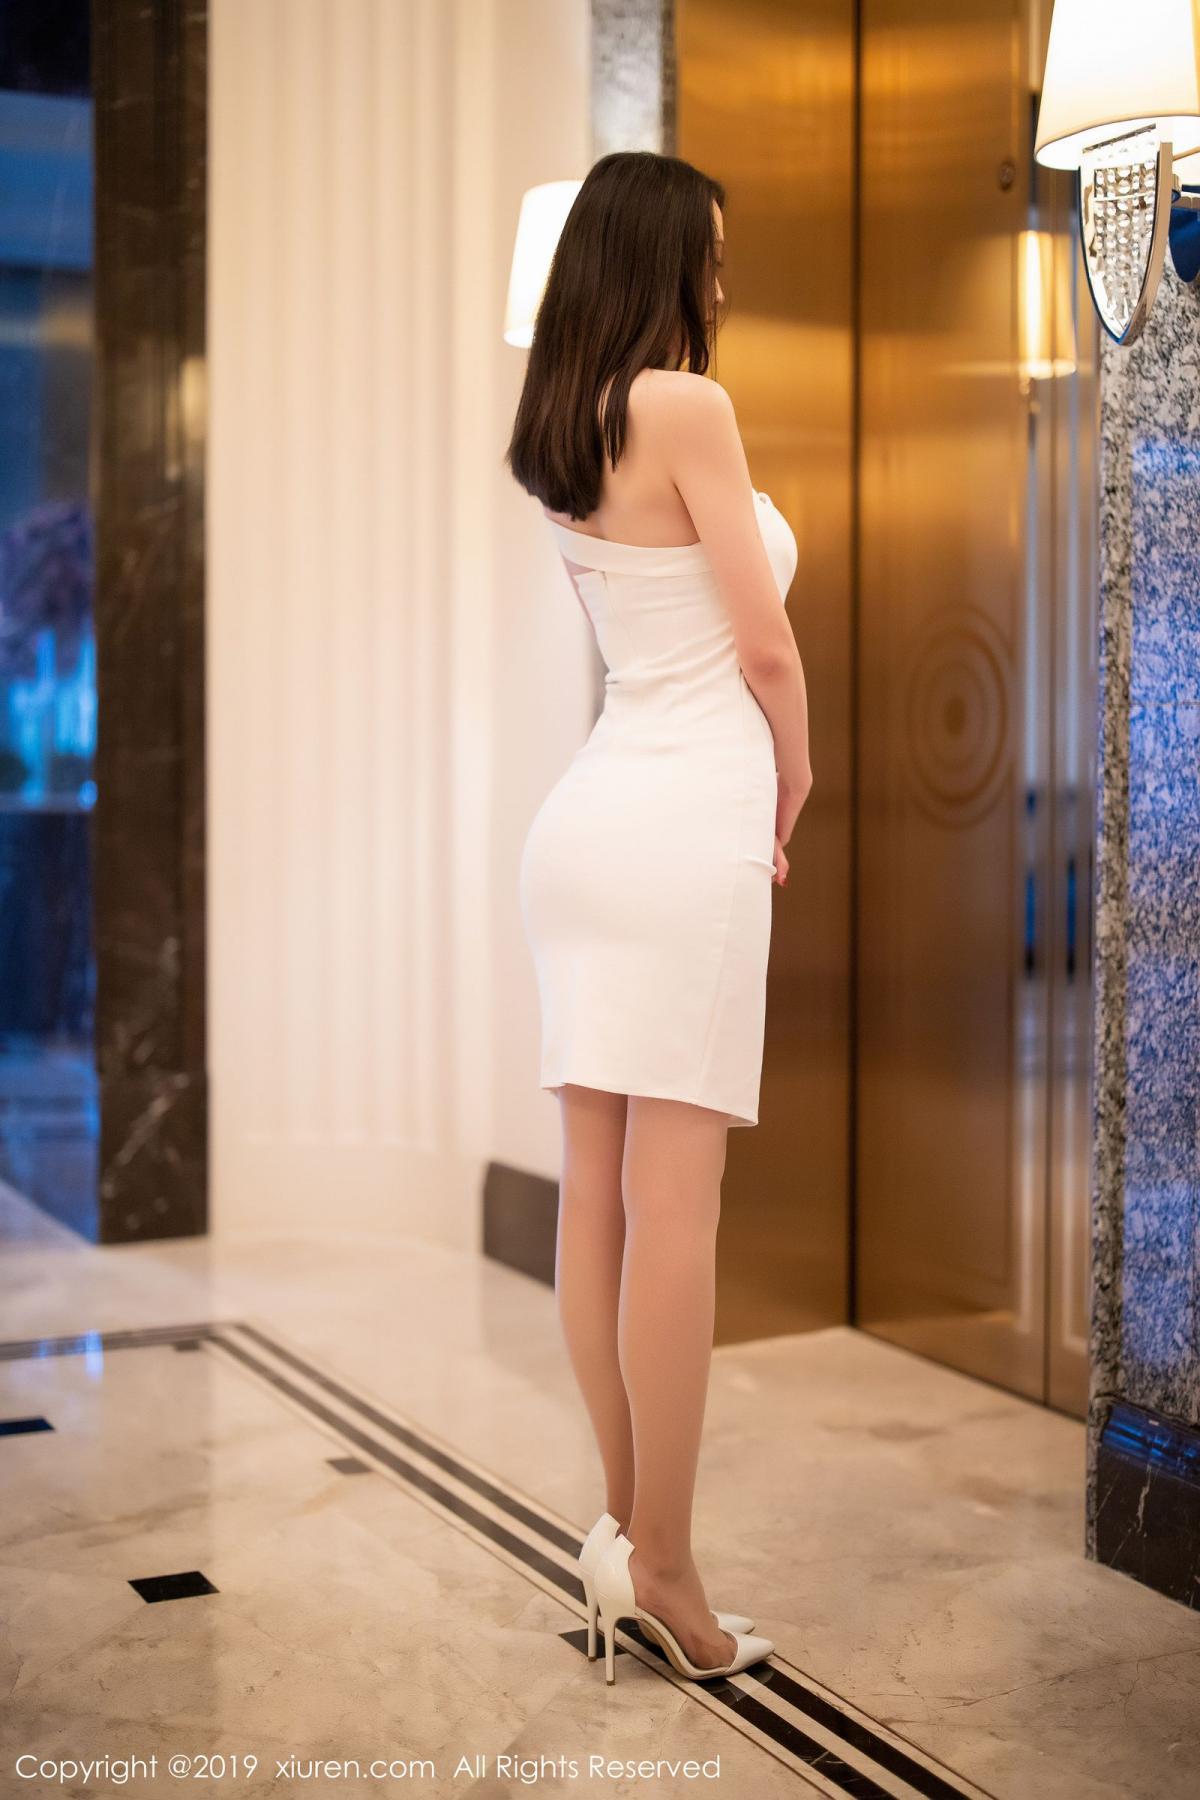 [XiuRen] Vol.1861 Meng Xin Yue 41P, Meng Xin Yue, Tall, Temperament, Uniform, Xiuren